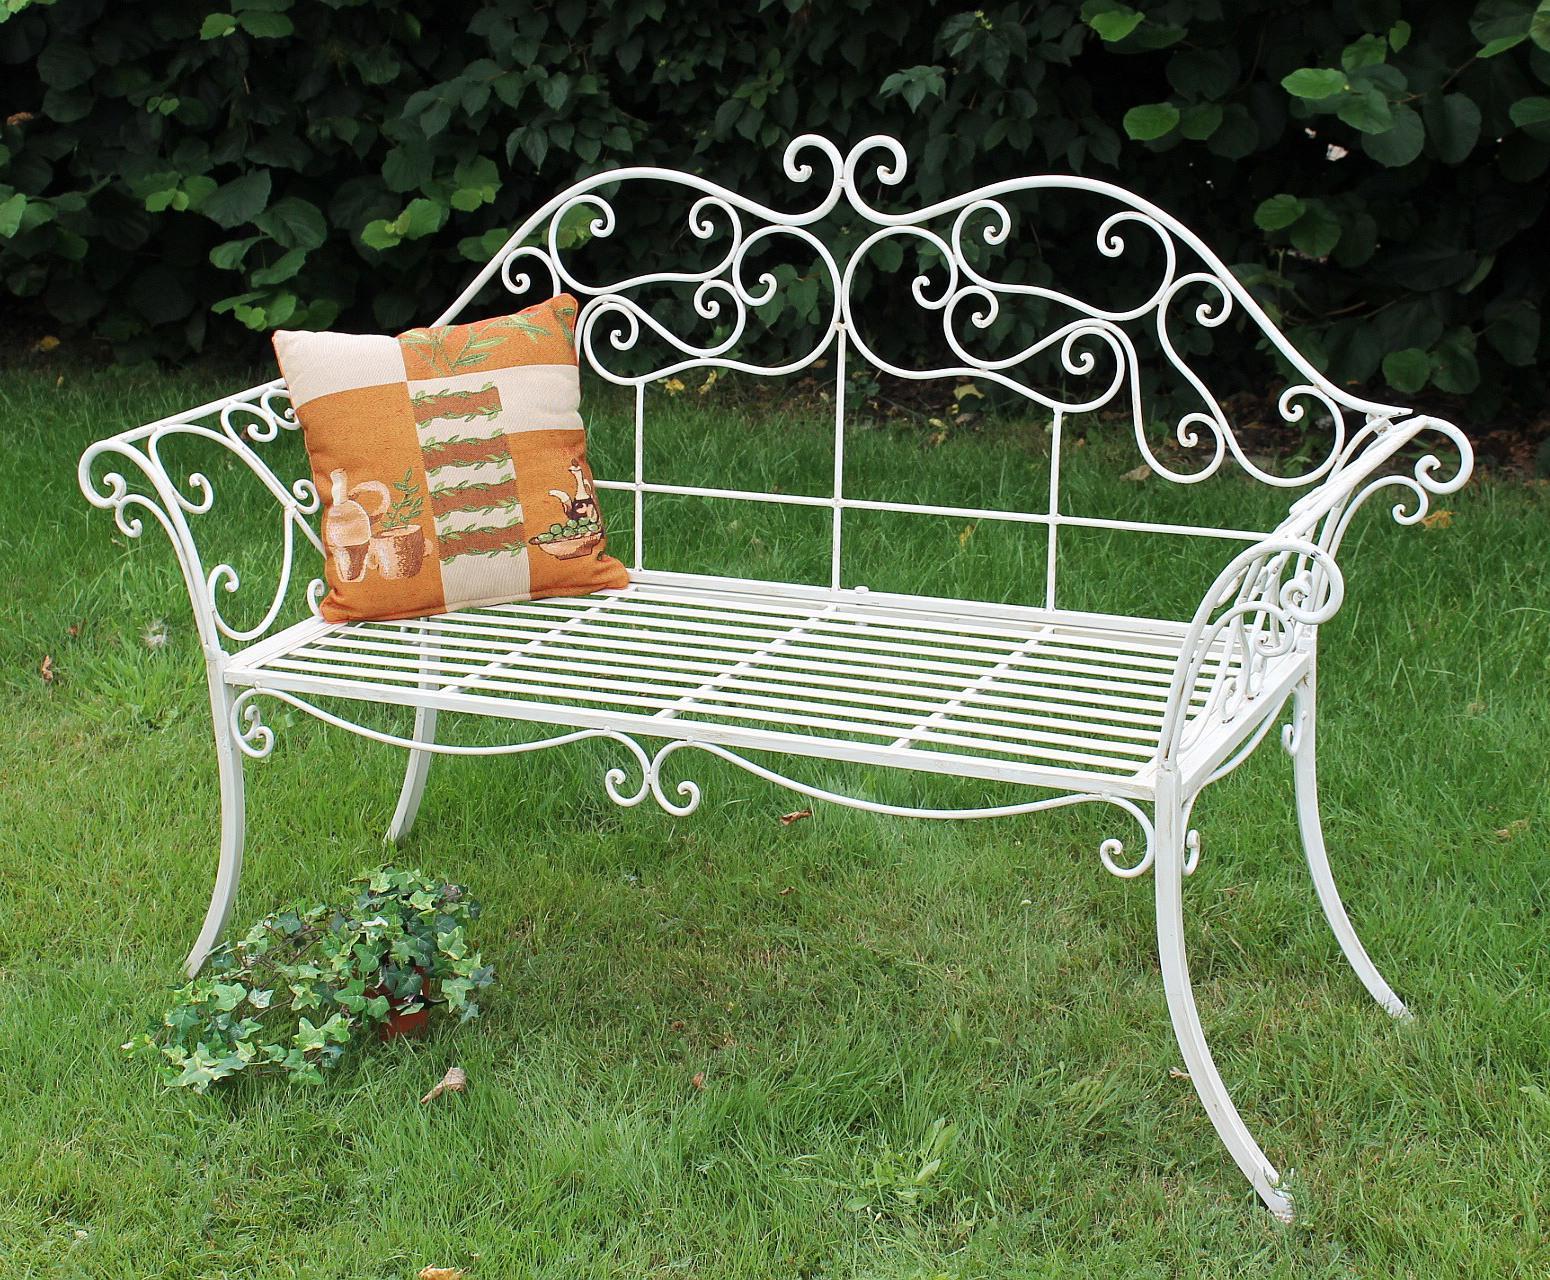 gartenbank romance wei 111183 bank 146cm aus. Black Bedroom Furniture Sets. Home Design Ideas